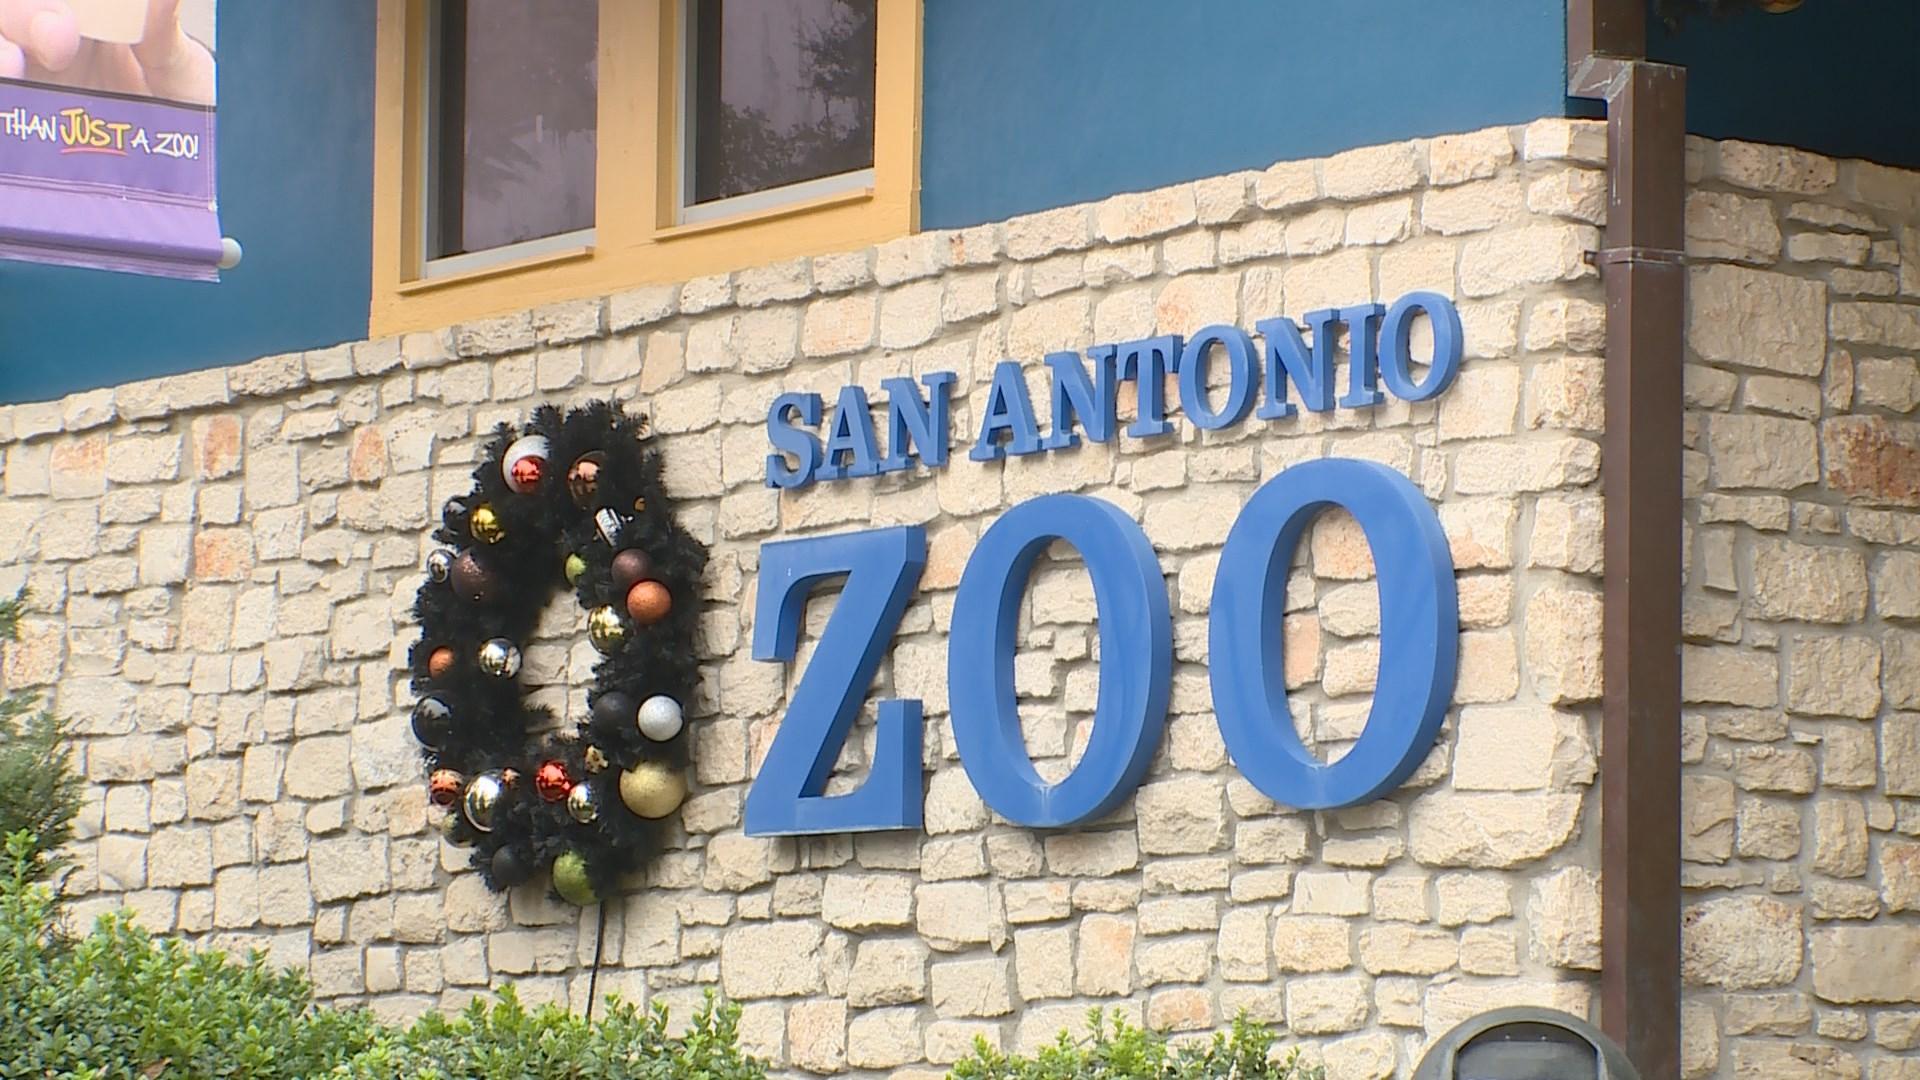 S A Zoo Seeking More Than 100 Job Candidates Kens5 Com